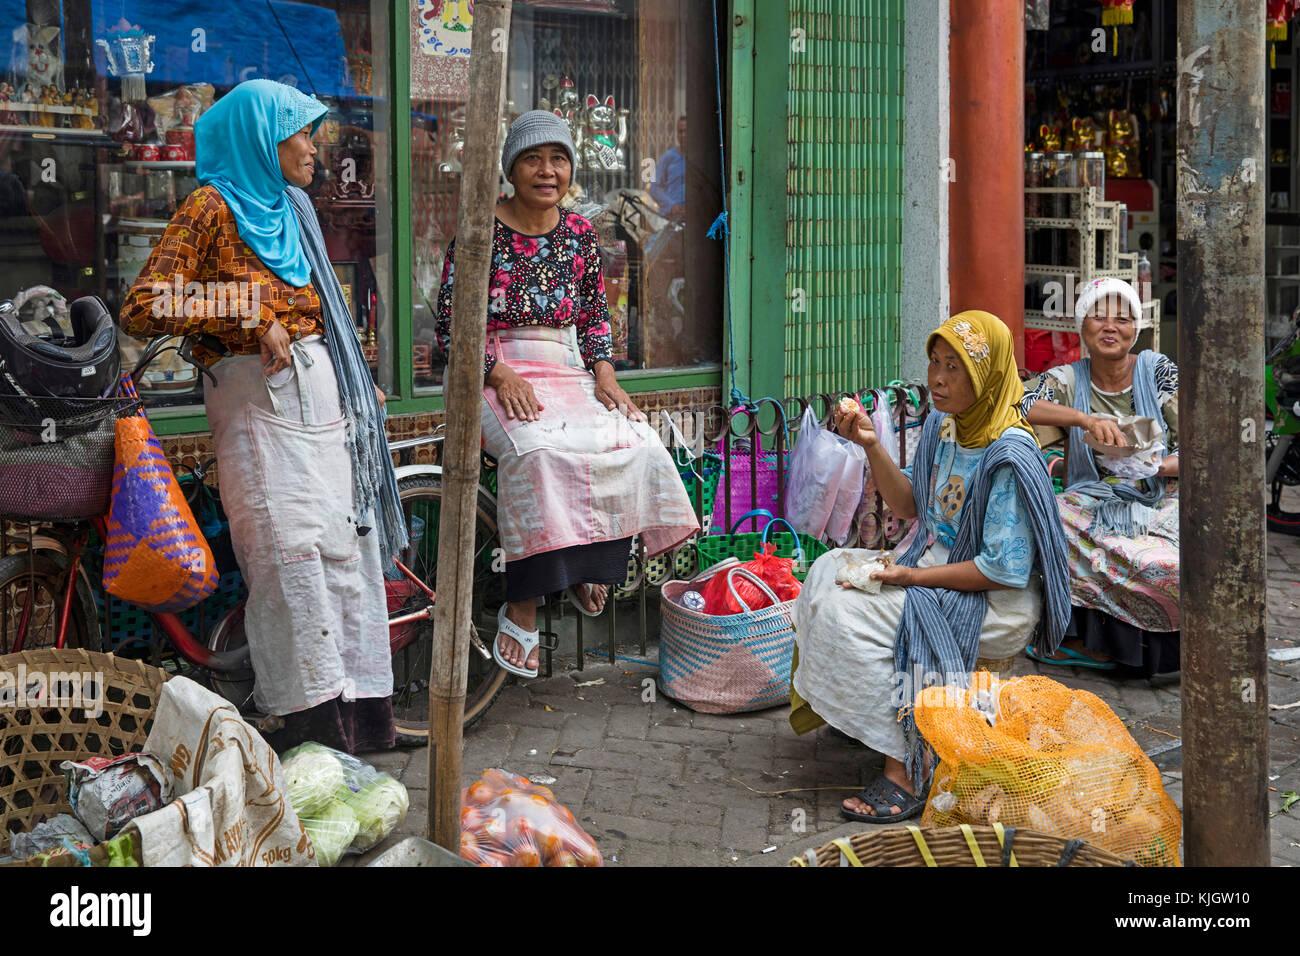 Javanese women chatting at market in Chinatown / Kampung Pecinan Semawis of the city Semarang, Central Java, Indonesia Stock Photo